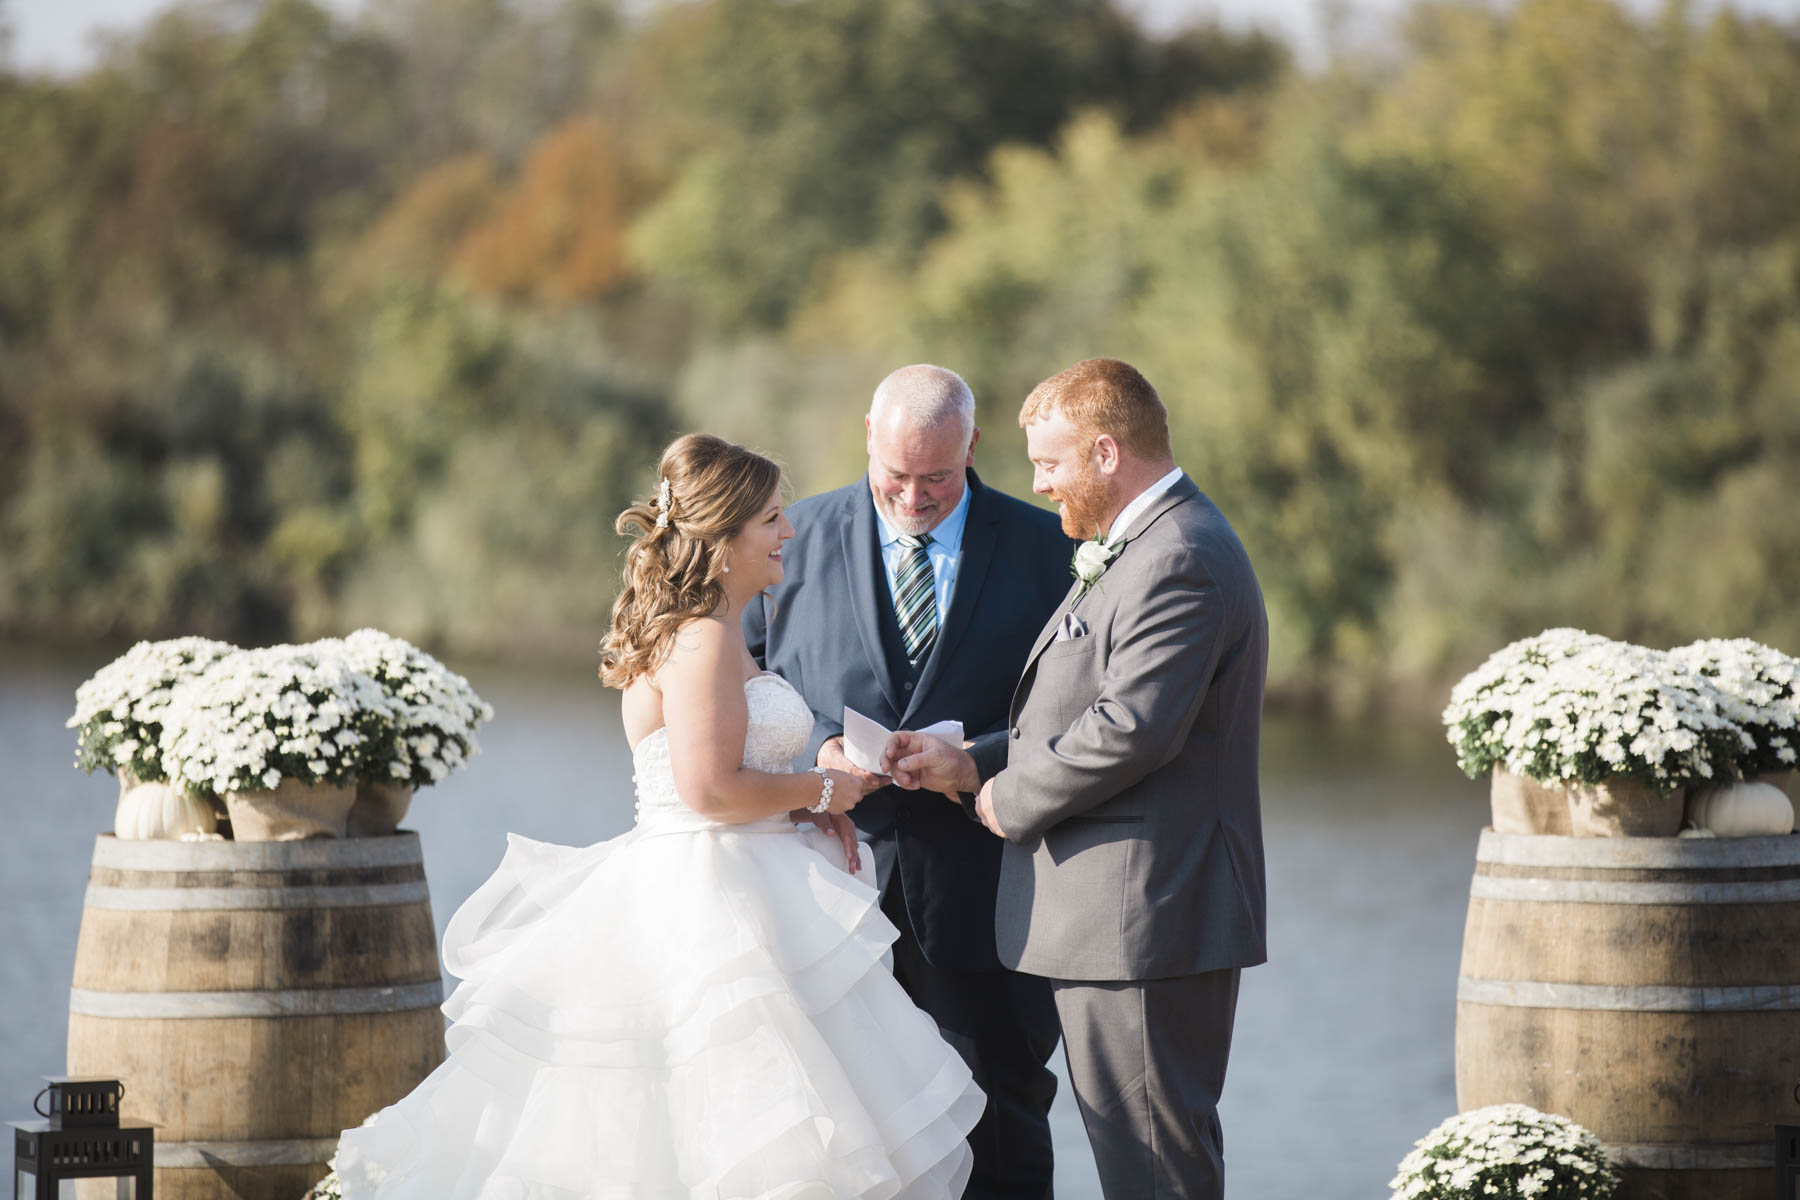 shotbychelsea_blog_wedding-24.jpg